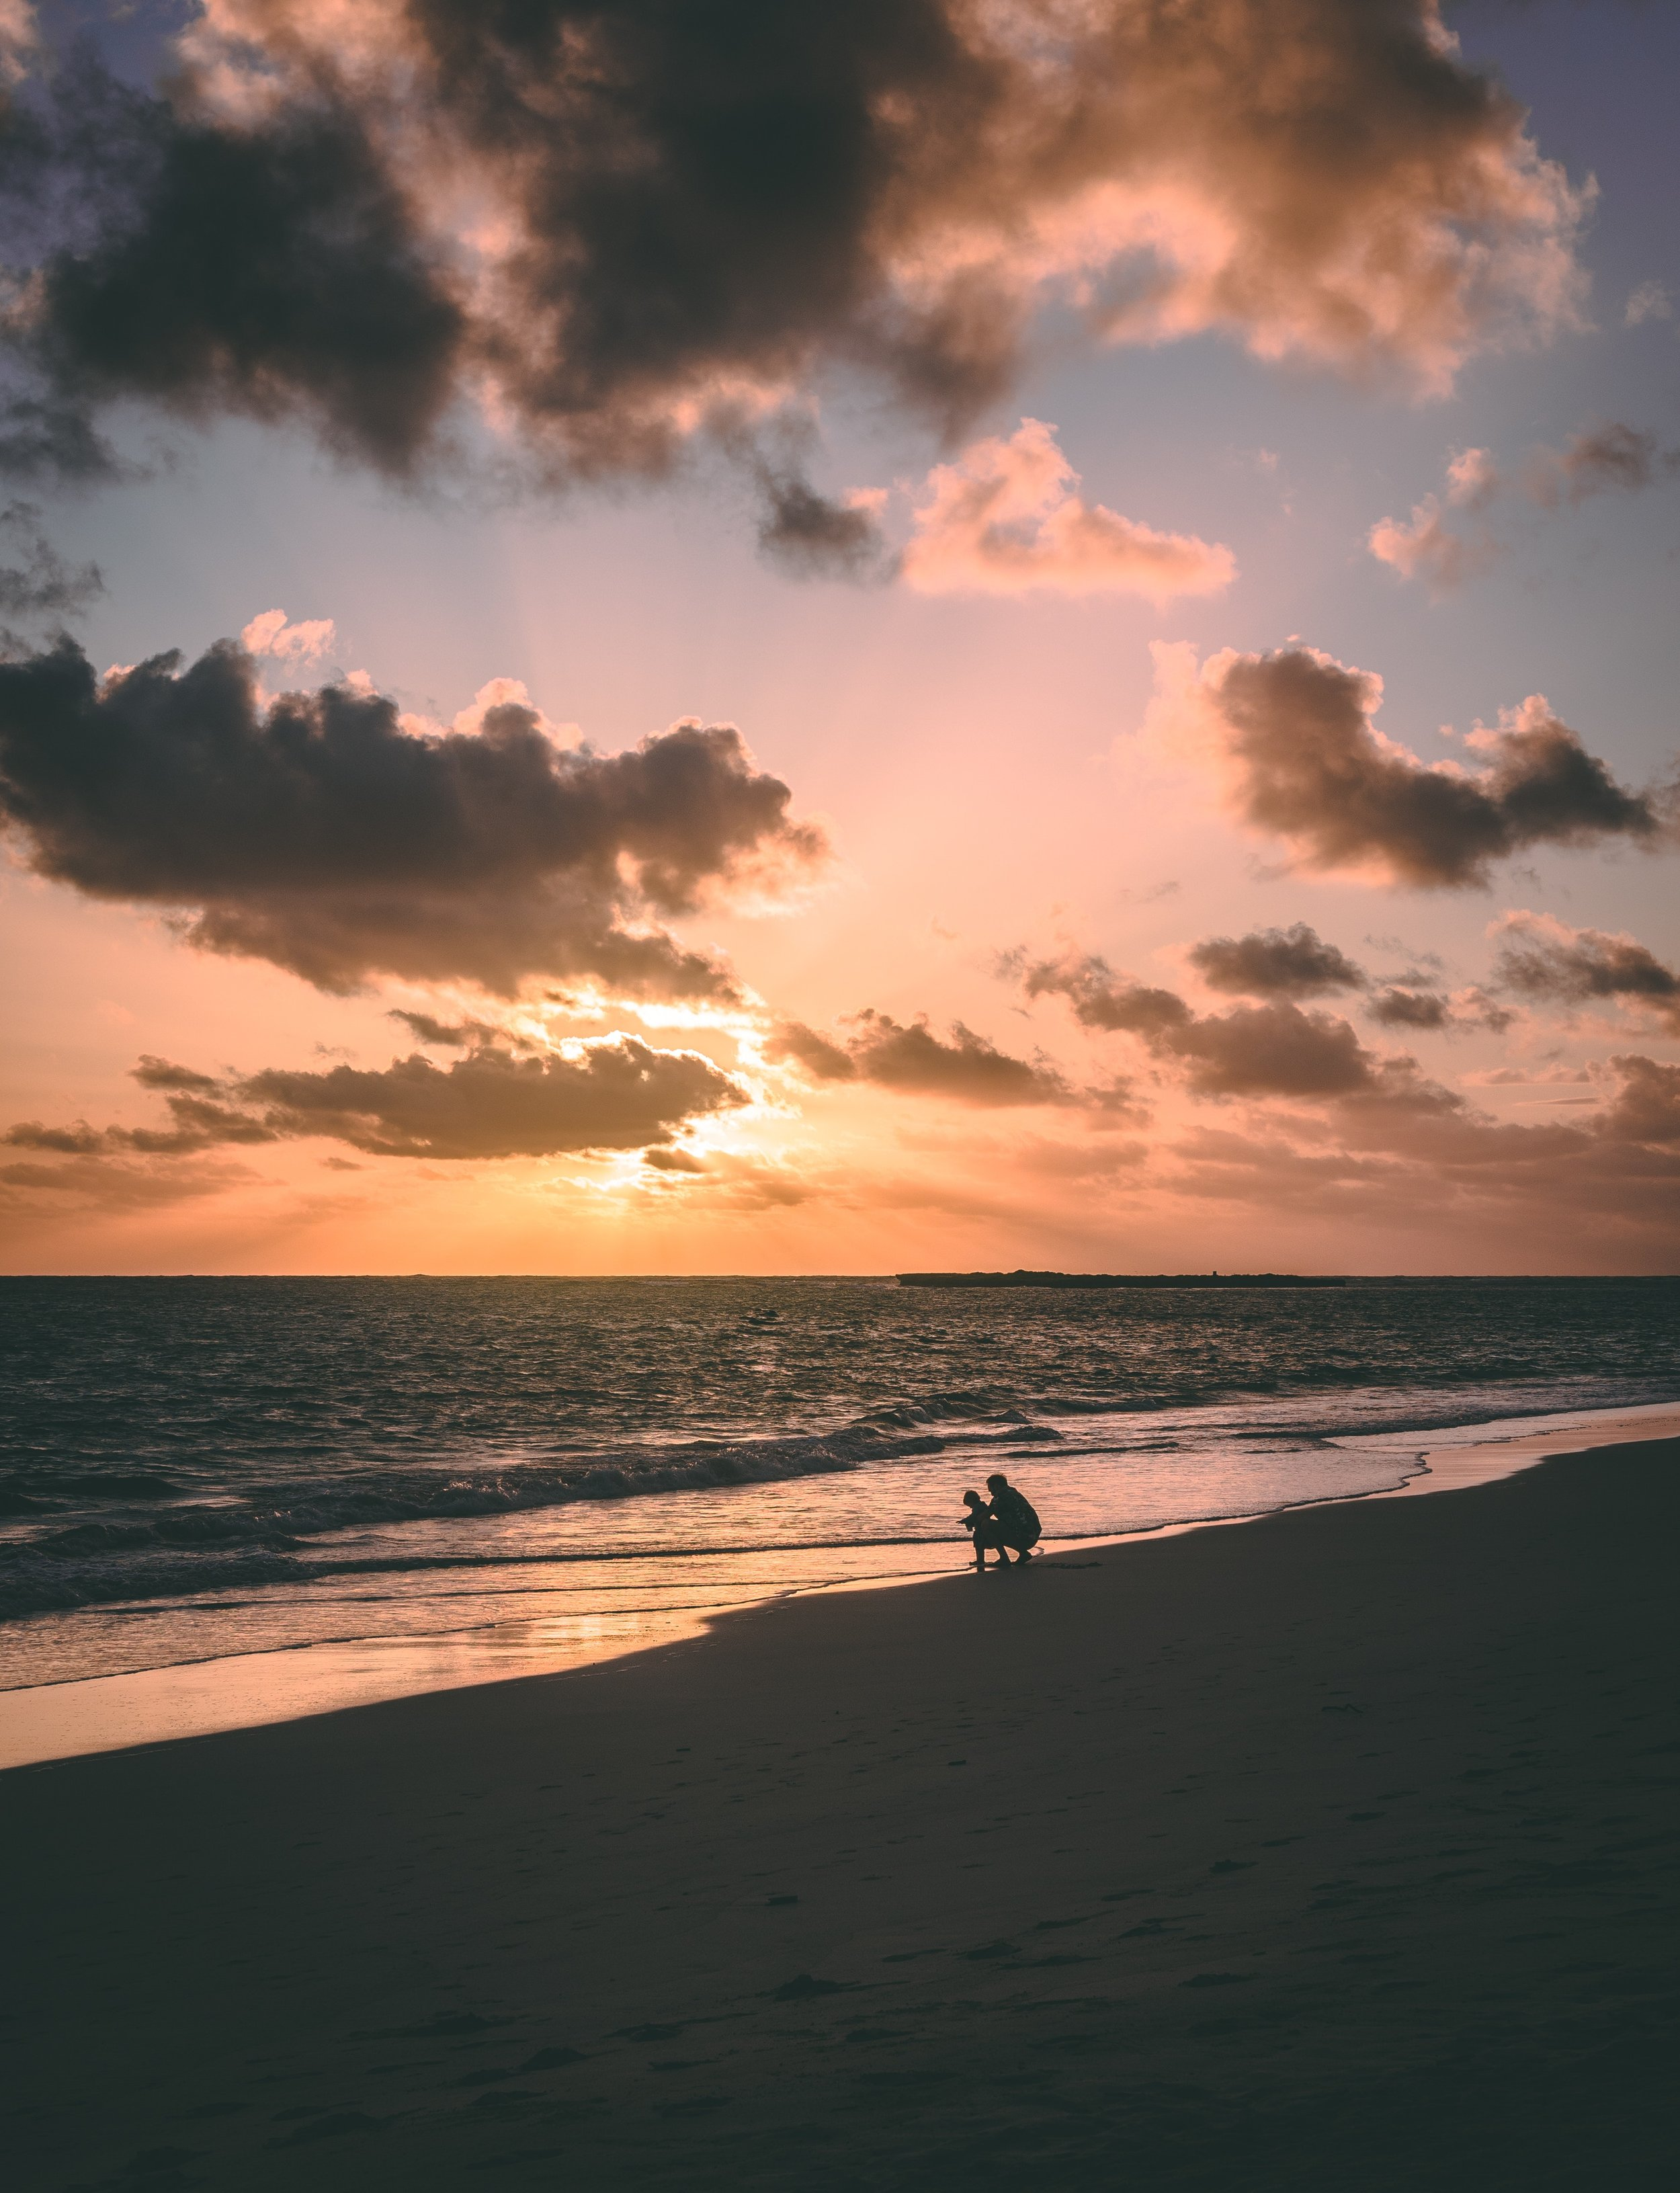 beach-child-dad-Pexels.jpg